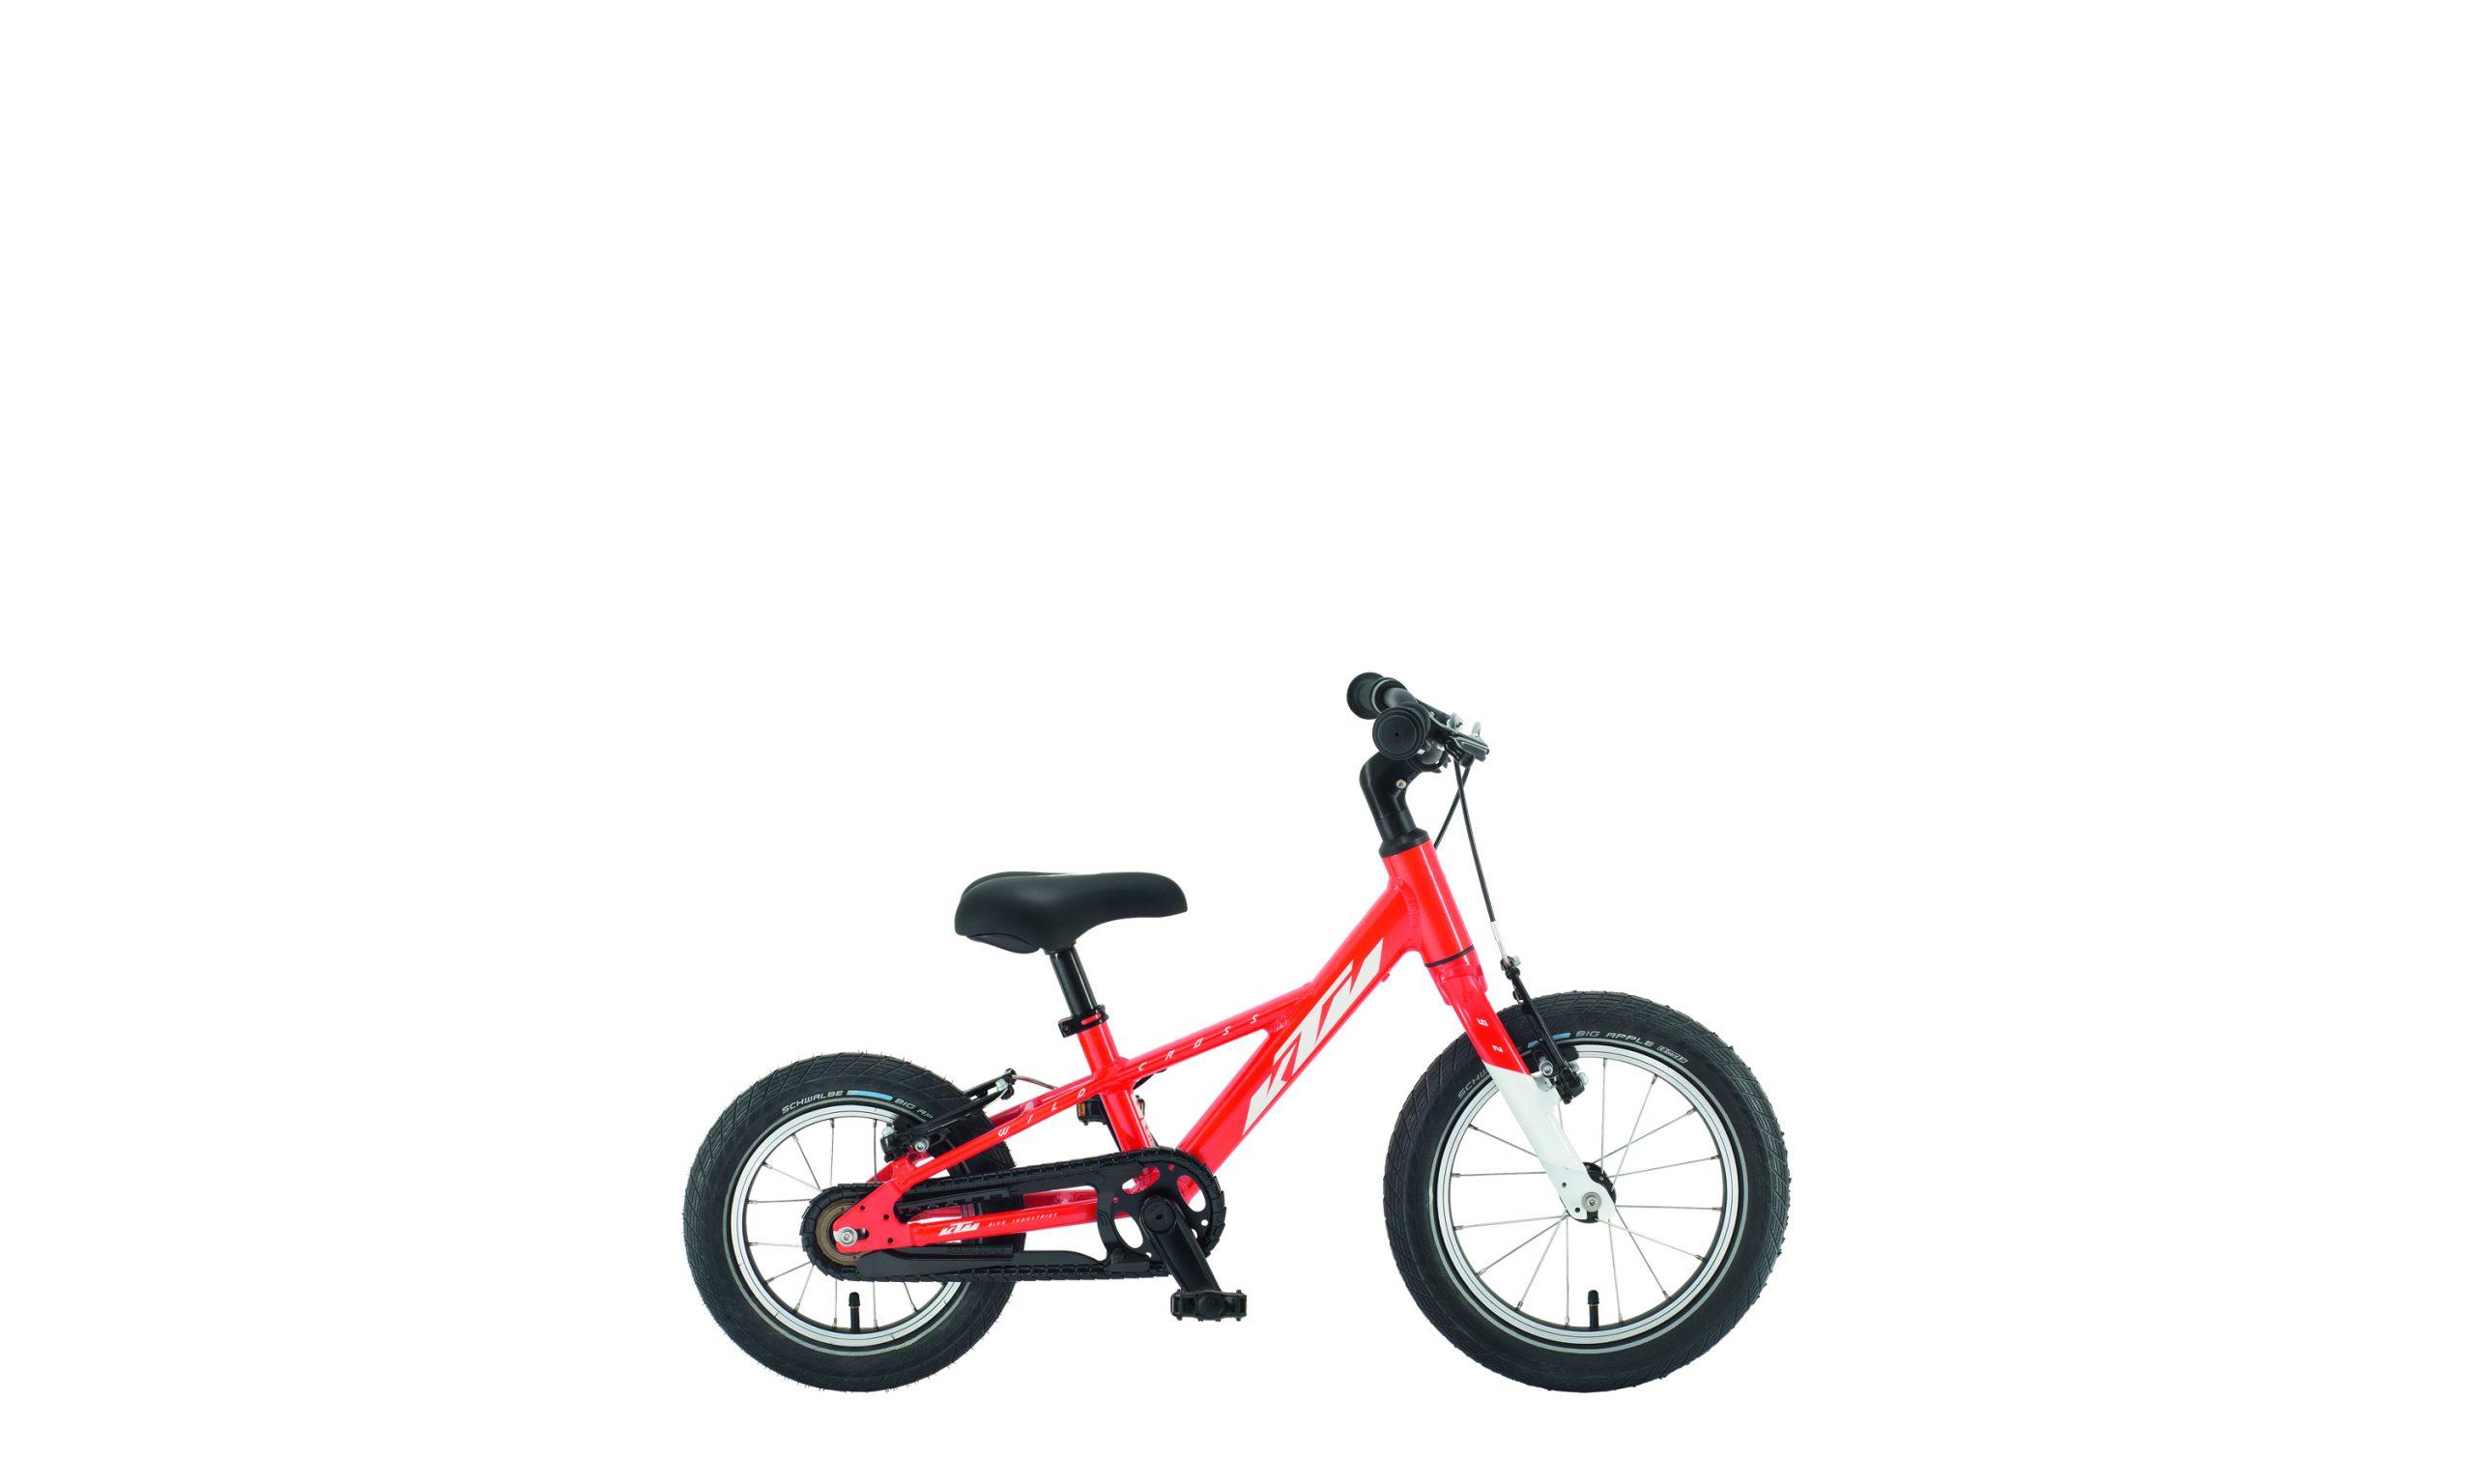 KTM Bike - WILD CROSS 12